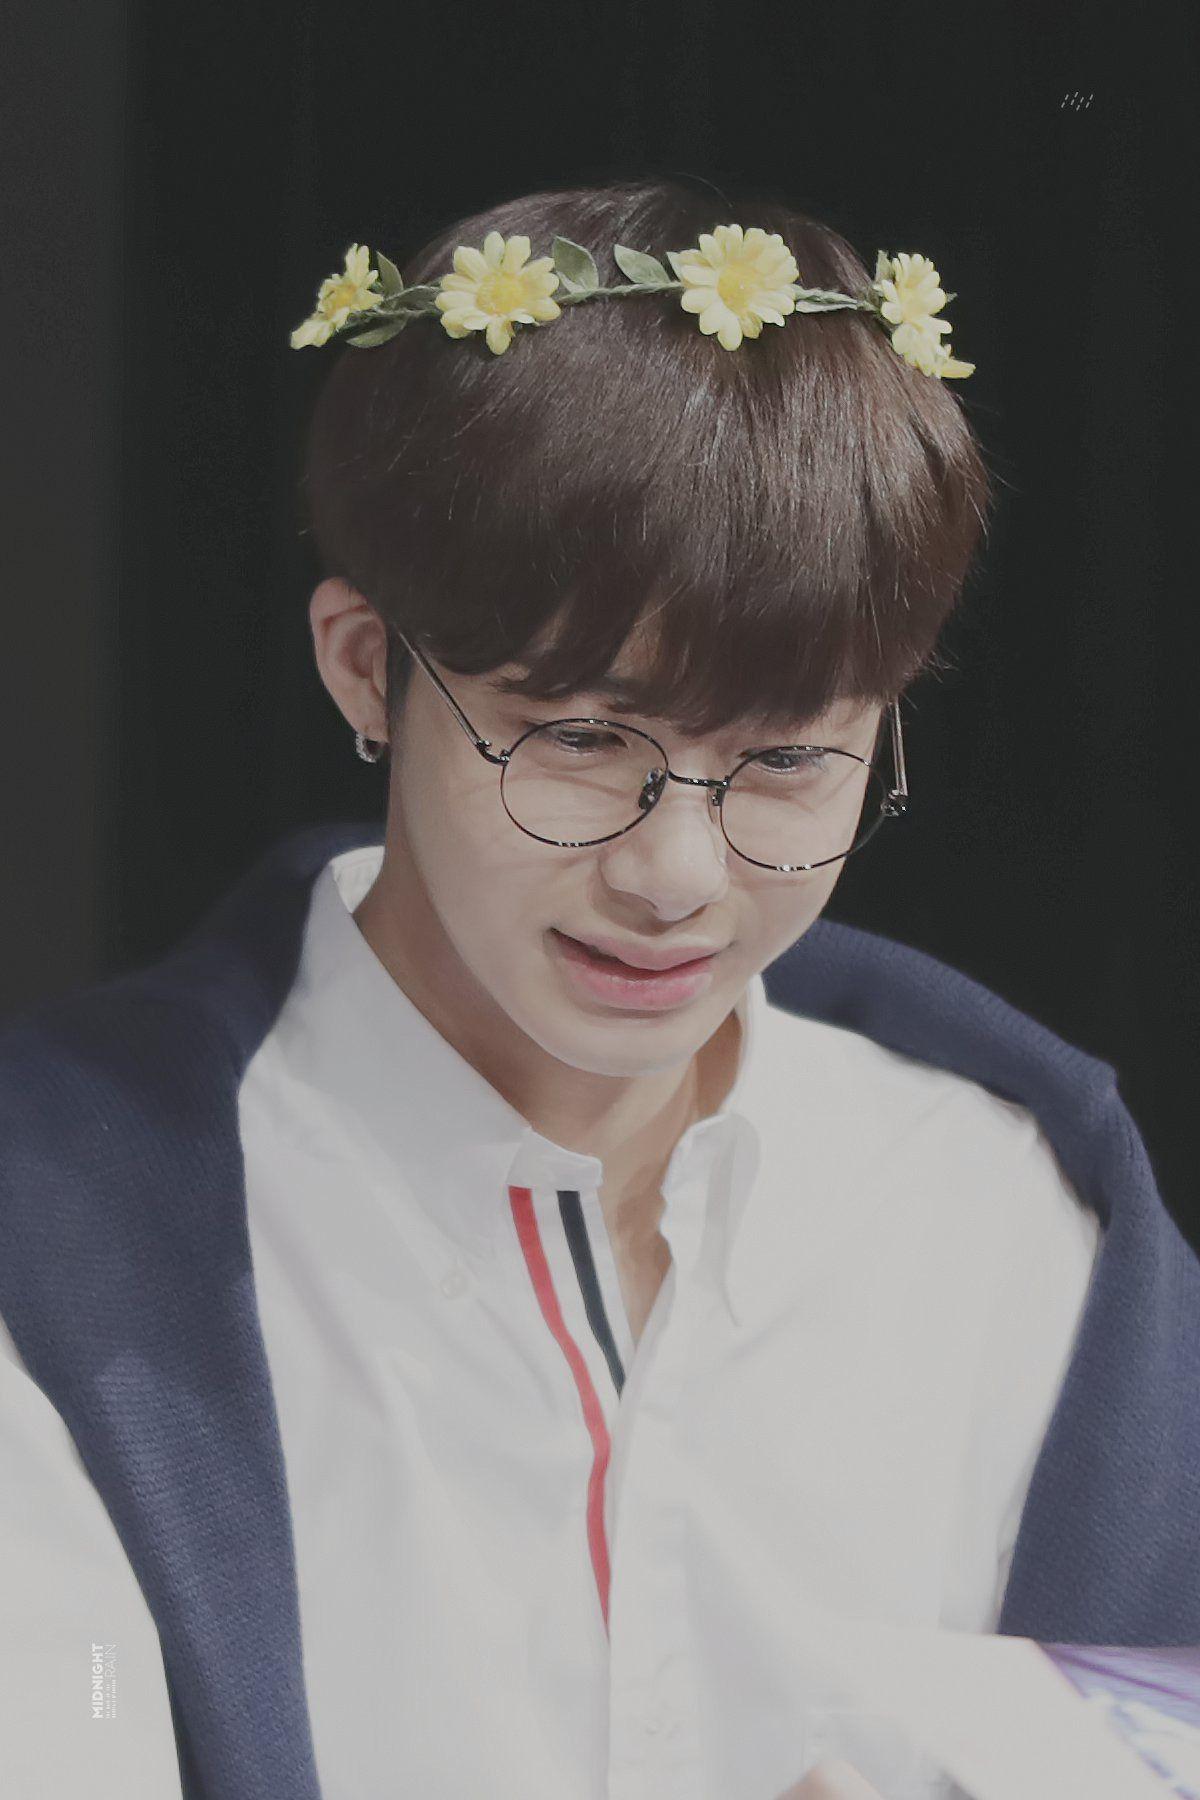 Black and yellow hair boy midnight train ϟ do not edit or crop logo ud  hyungwon  pinterest